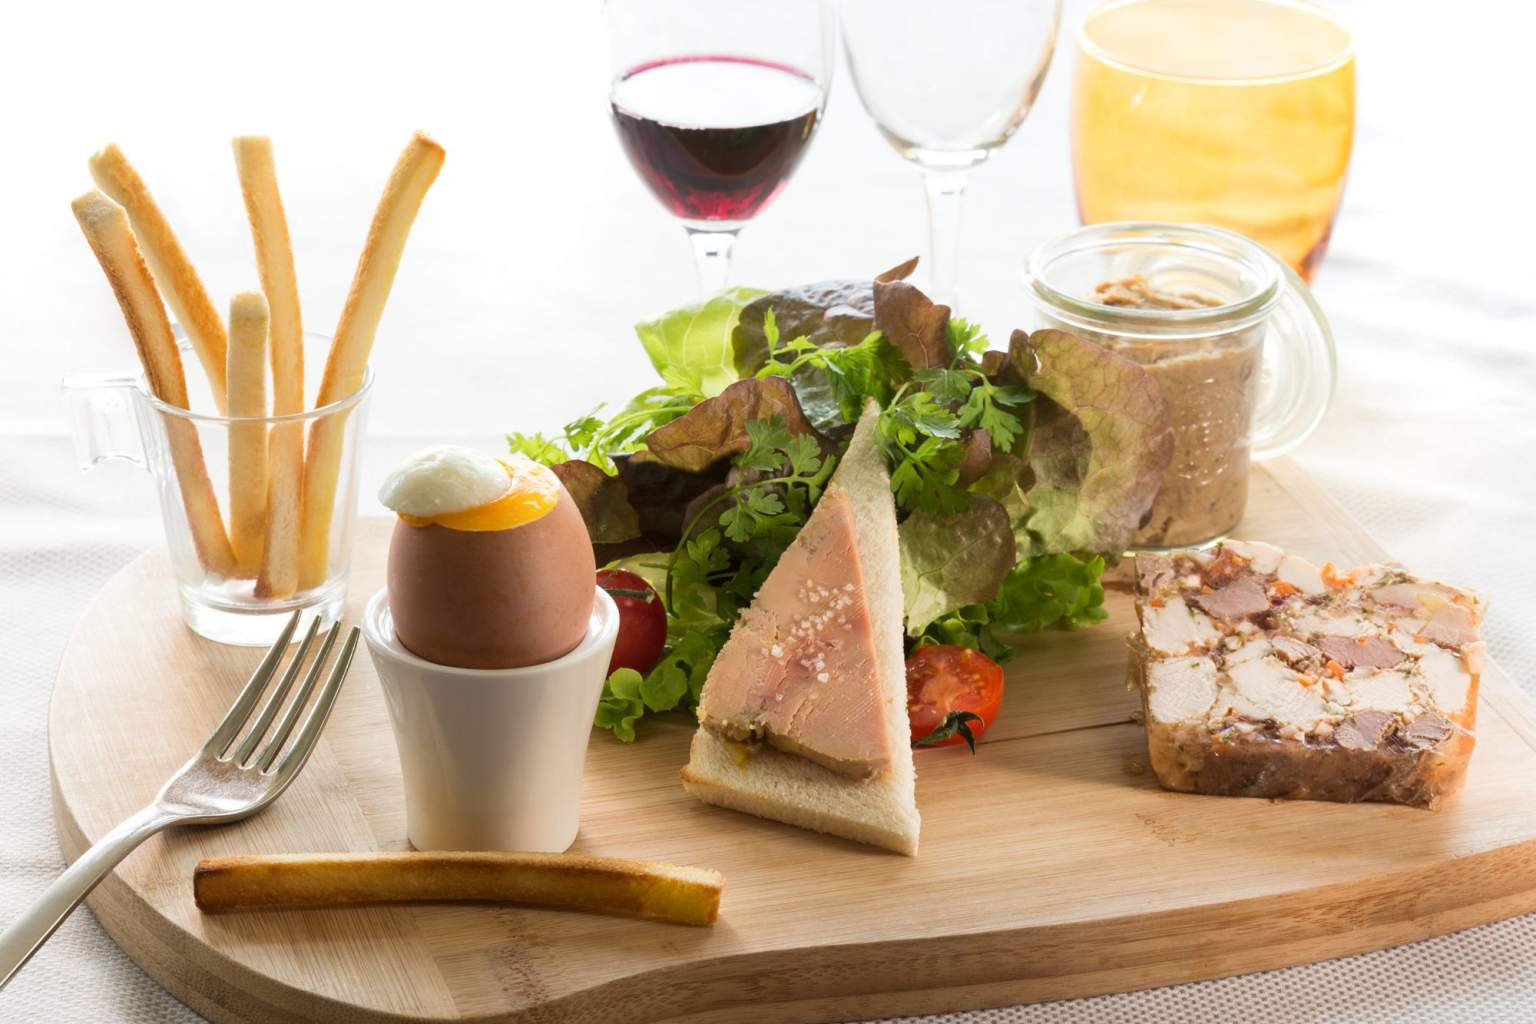 A main course from La Table du Coq